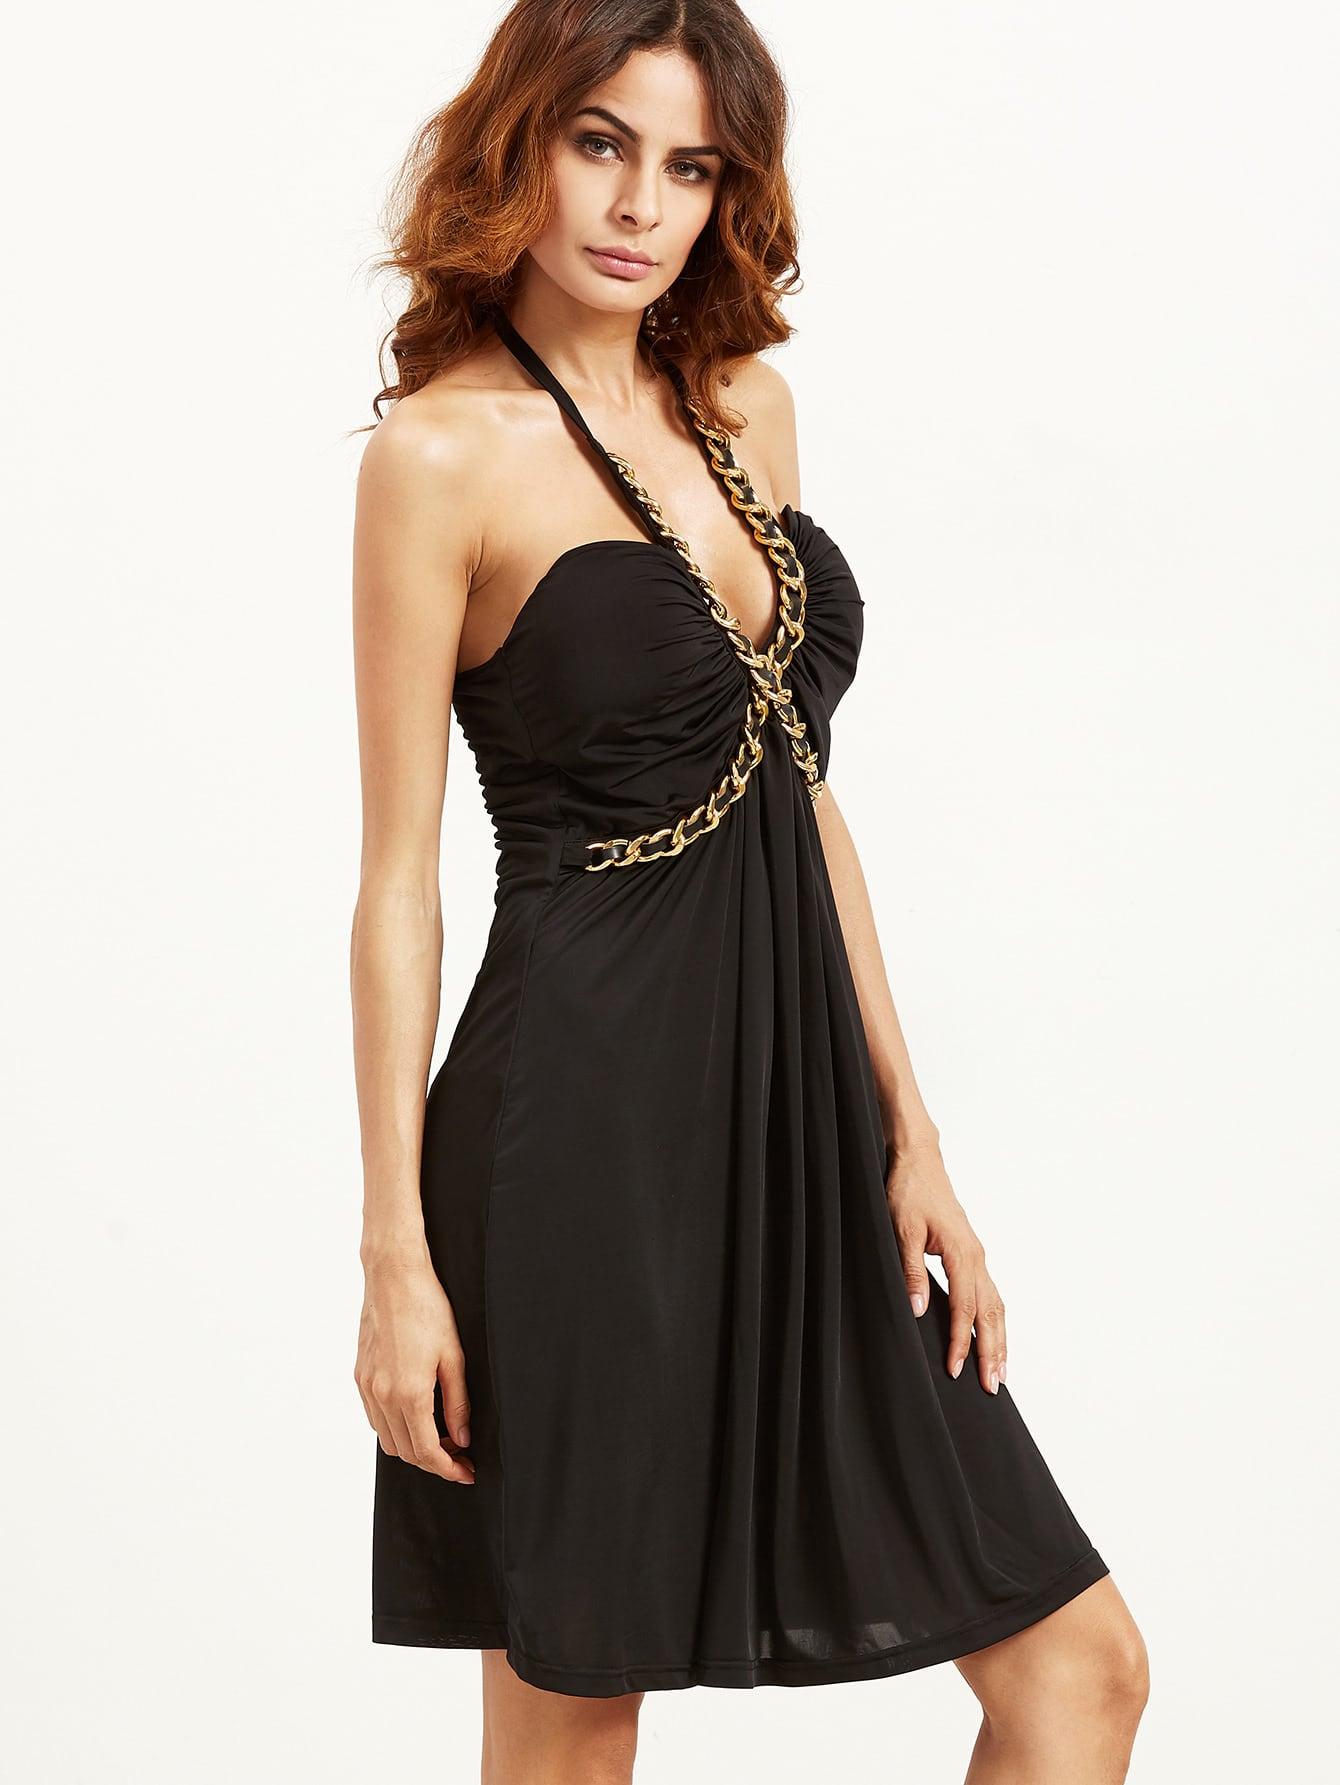 Black Criss Cross Chain Halter Dress sequined halter chain dress